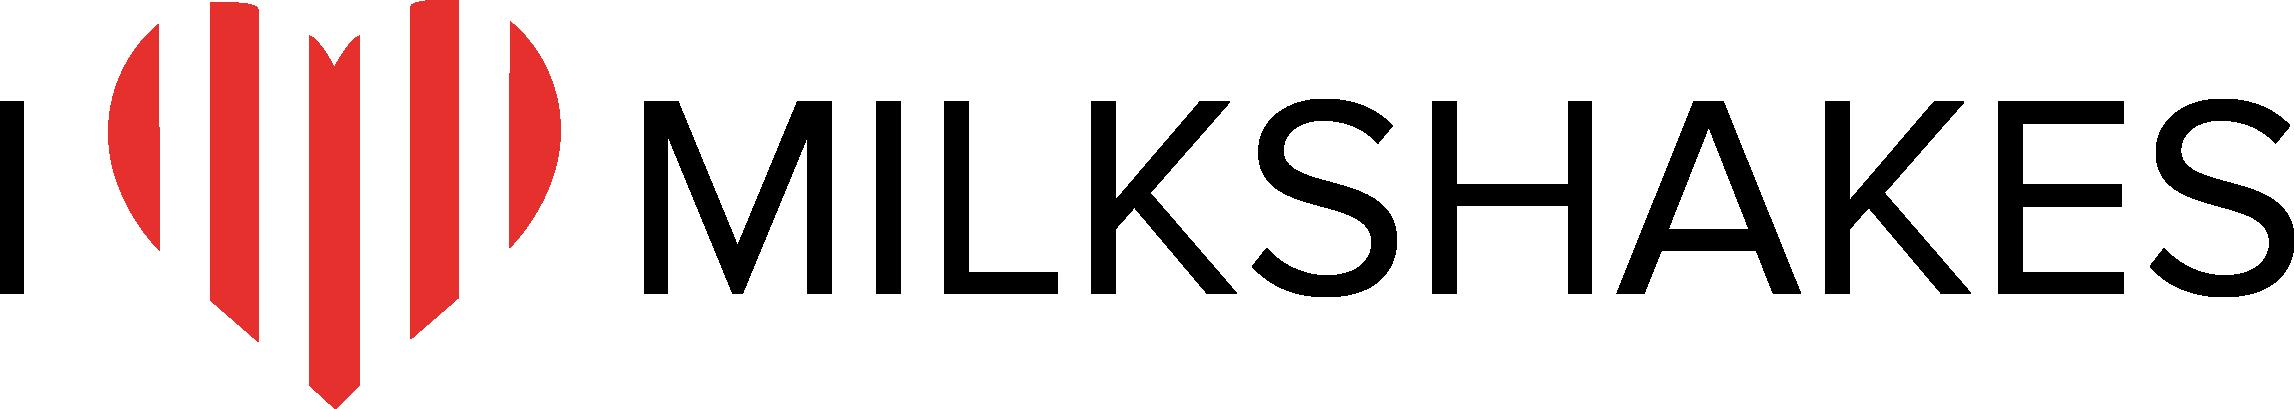 I Love Milkshakes                        Logo